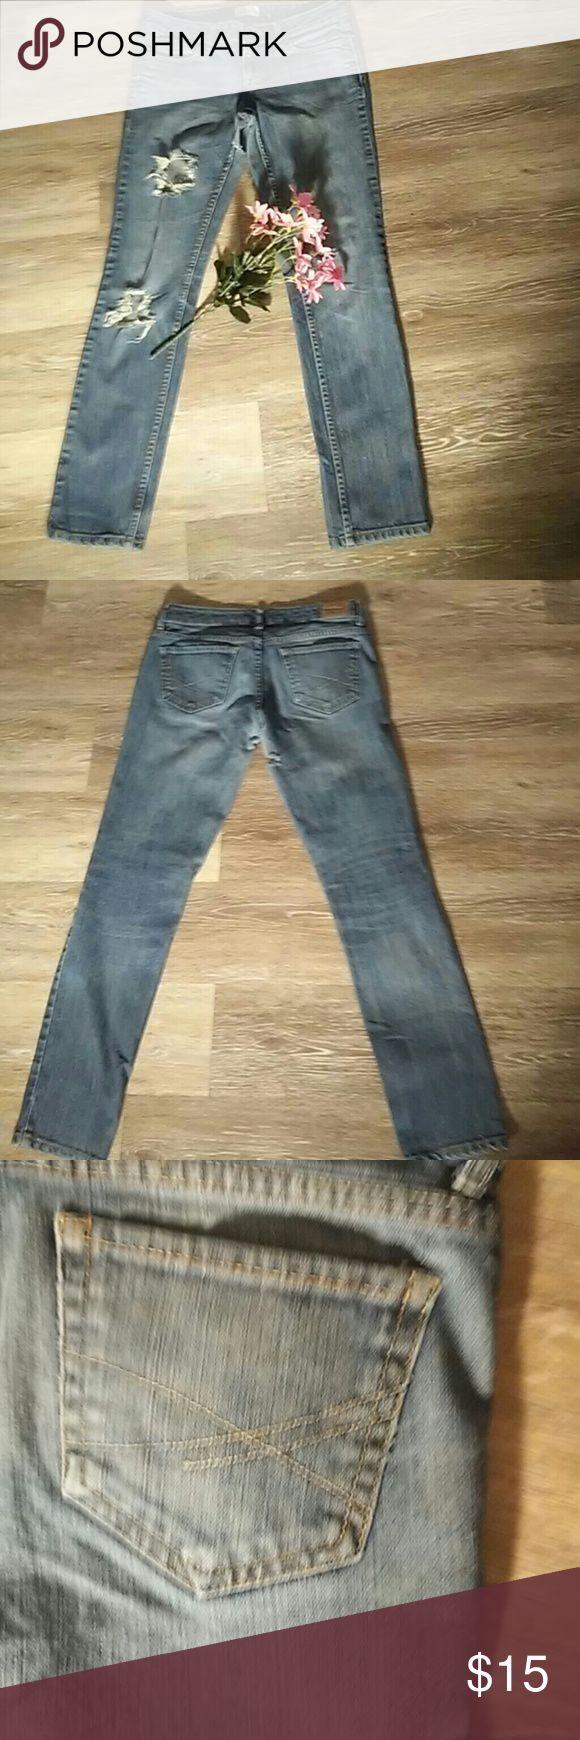 Aeropostale Bayla skinny jeans Aeropostale destroyed Bayla skinny jeans; good condition; inseam is 27 inches Aeropostale Jeans Skinny